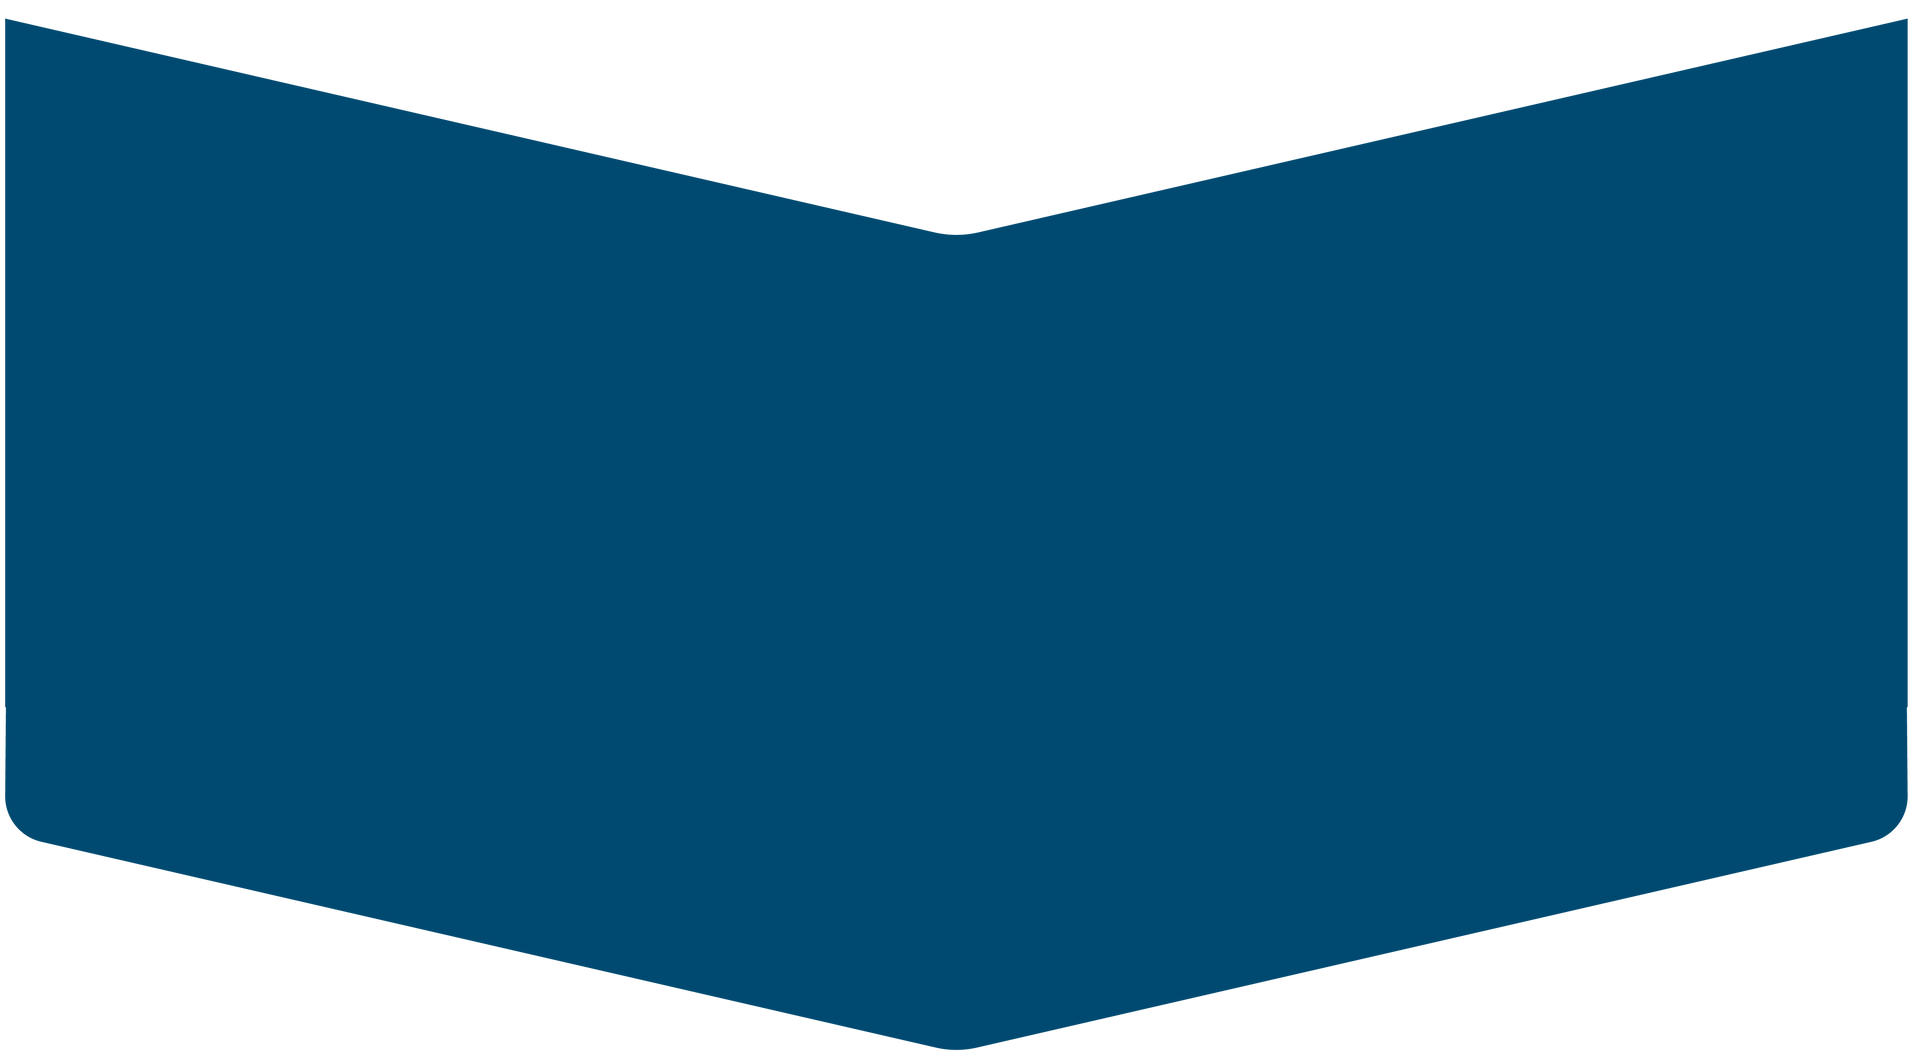 Salomons Groep Dronten V-vorm blauw-56.p